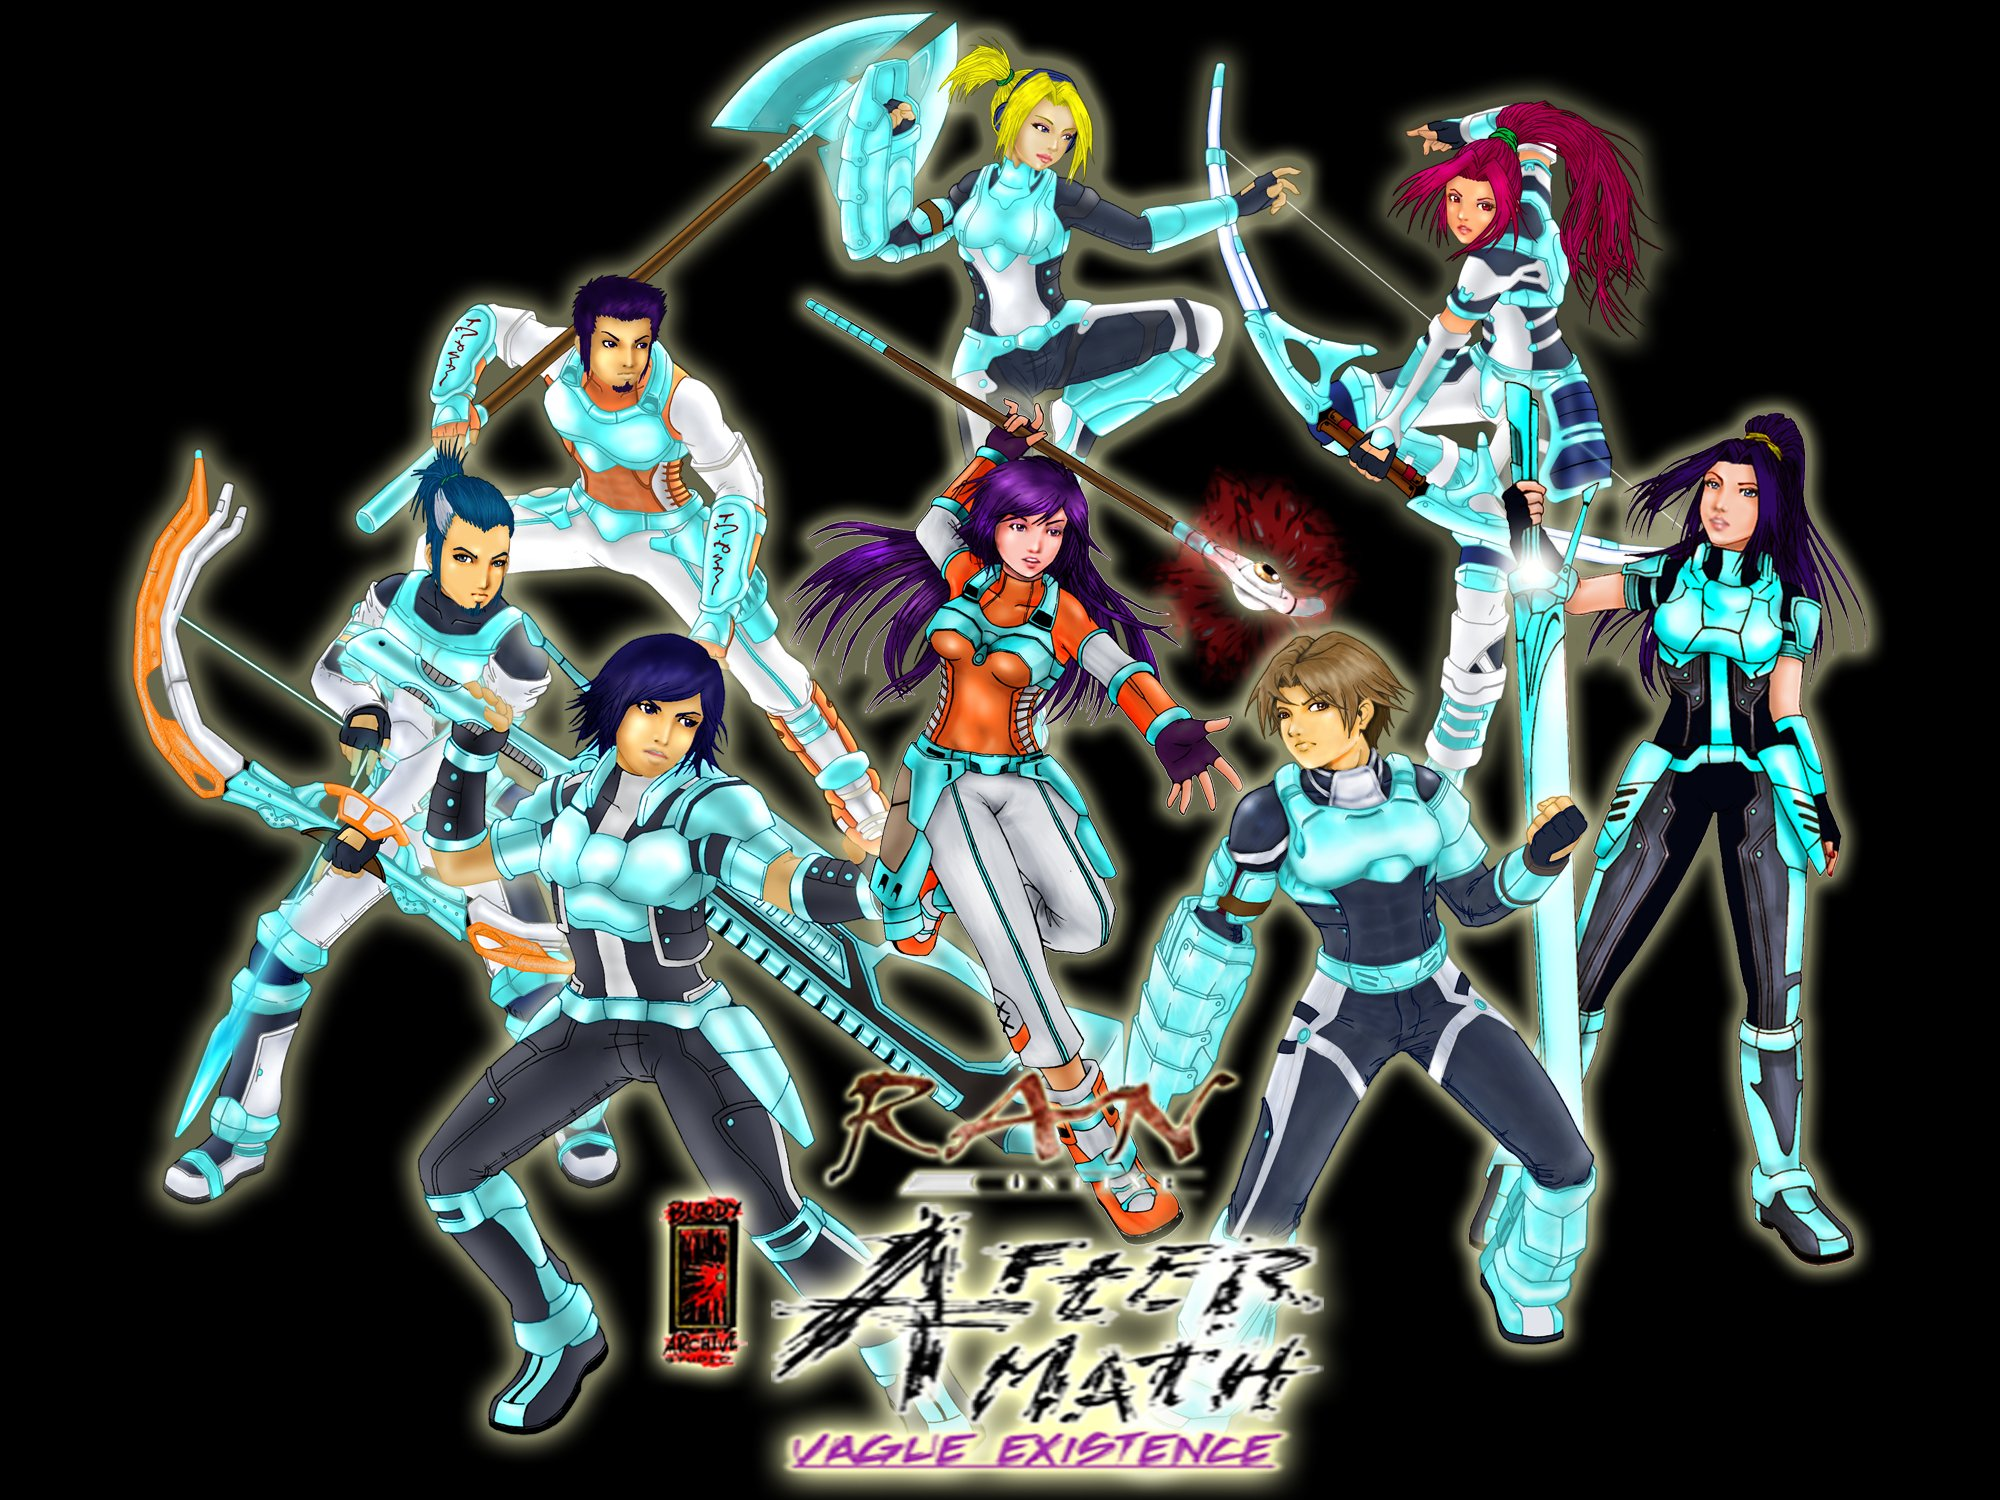 RAN ONLINE anime mmo rpg fantasy sci-fi action adventure ...